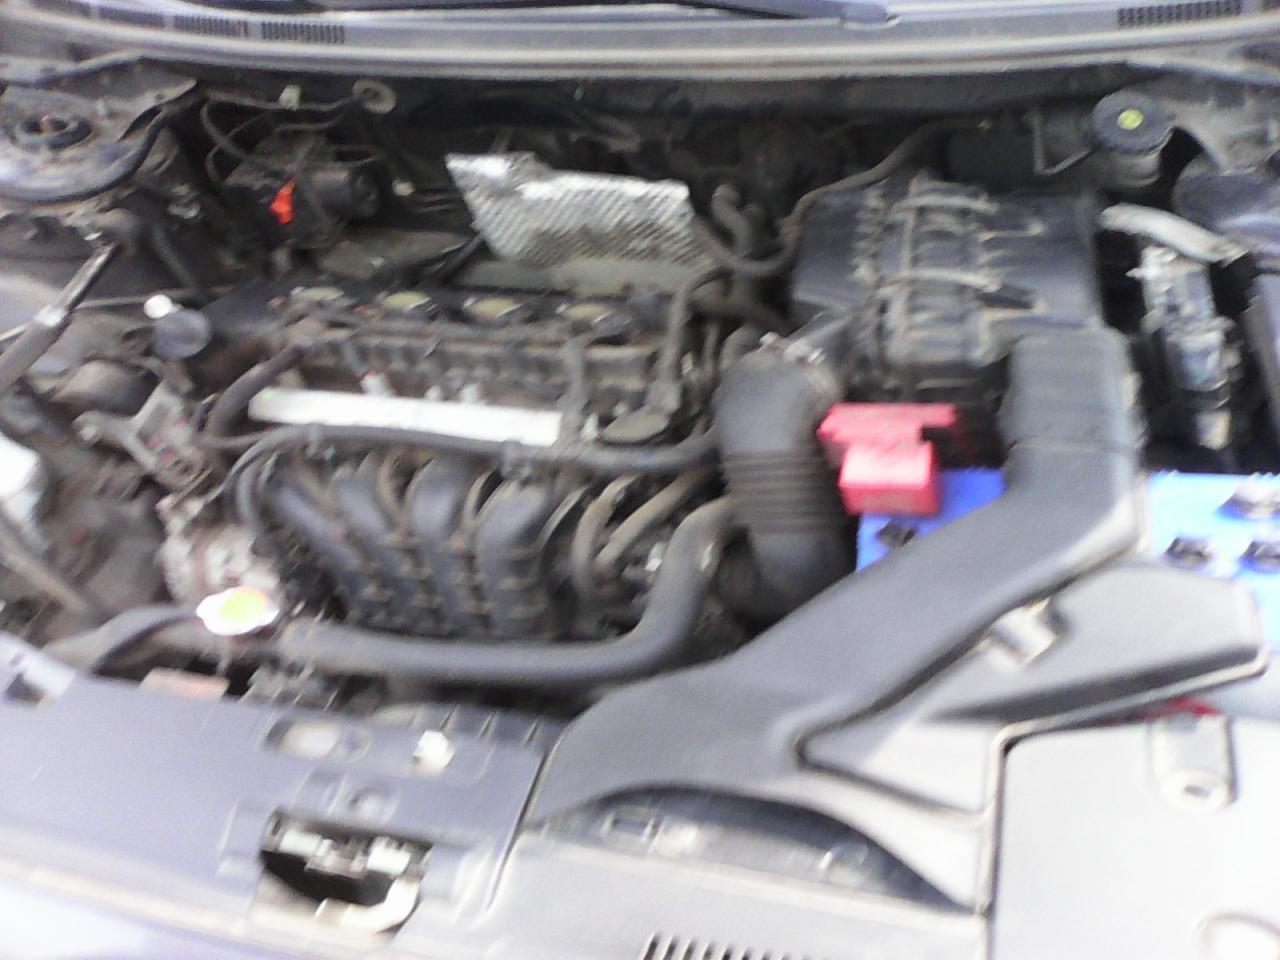 Mitsubishi Lancer EX-moteur